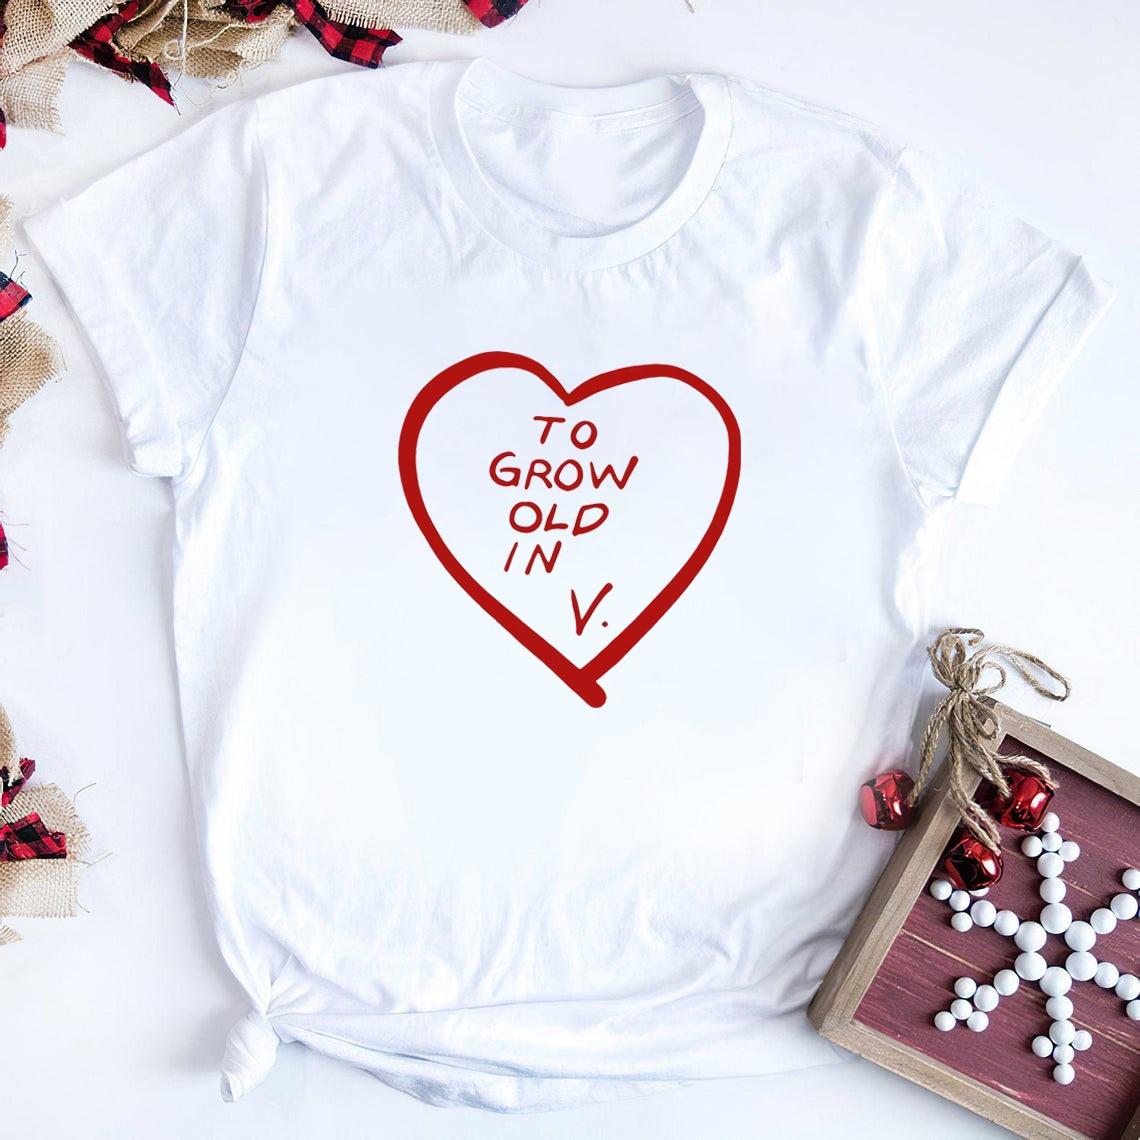 WandaVision Shirt To Grow Old In Vision T-Shirt Tv Show Inspired Sayings Shirts Superhero Scarlet Witch Tees Harajuku Tops